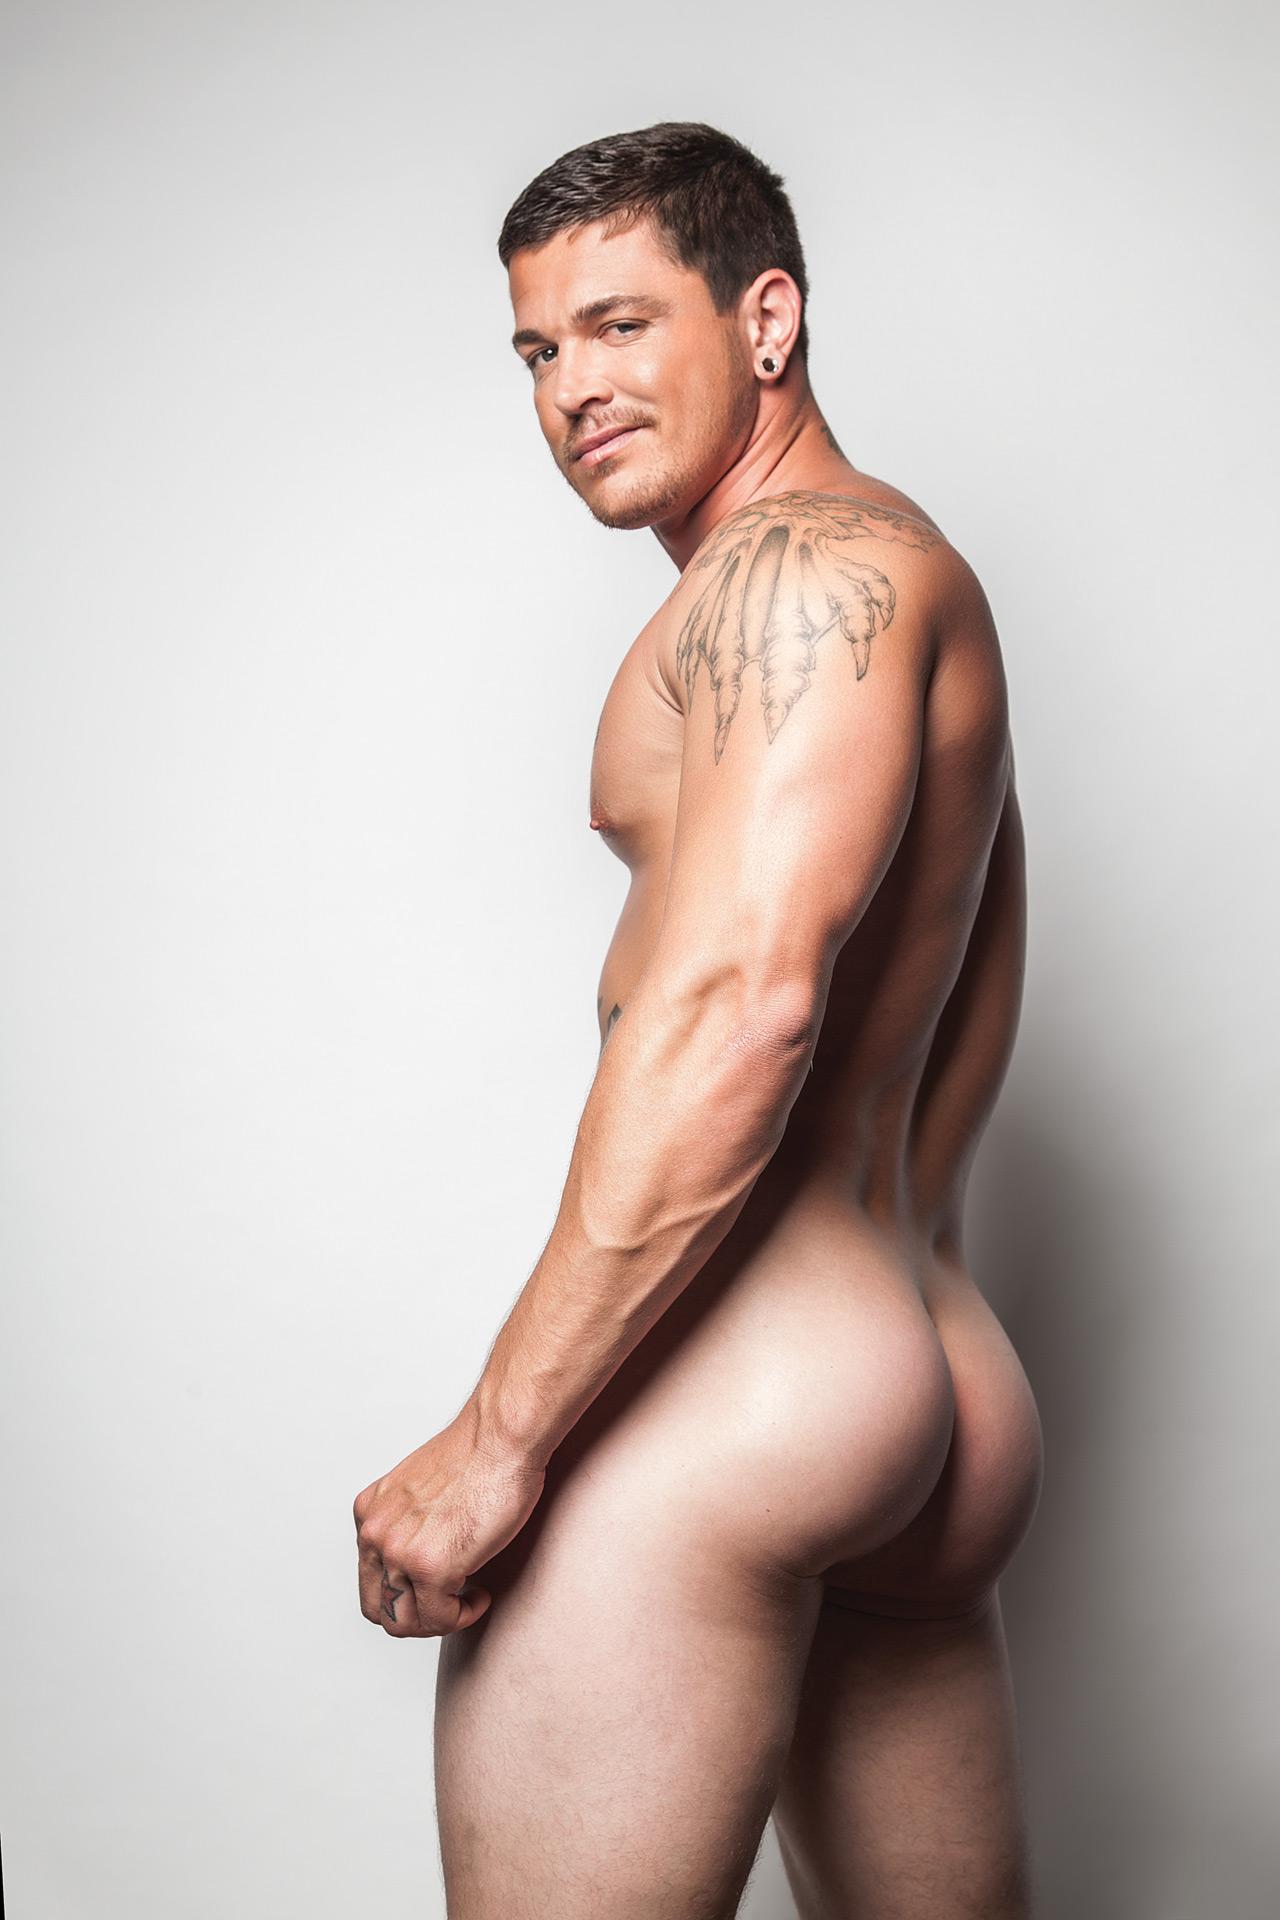 Actor Porno Milan Gamiani sebastian young porn star - pornstar - adult videos